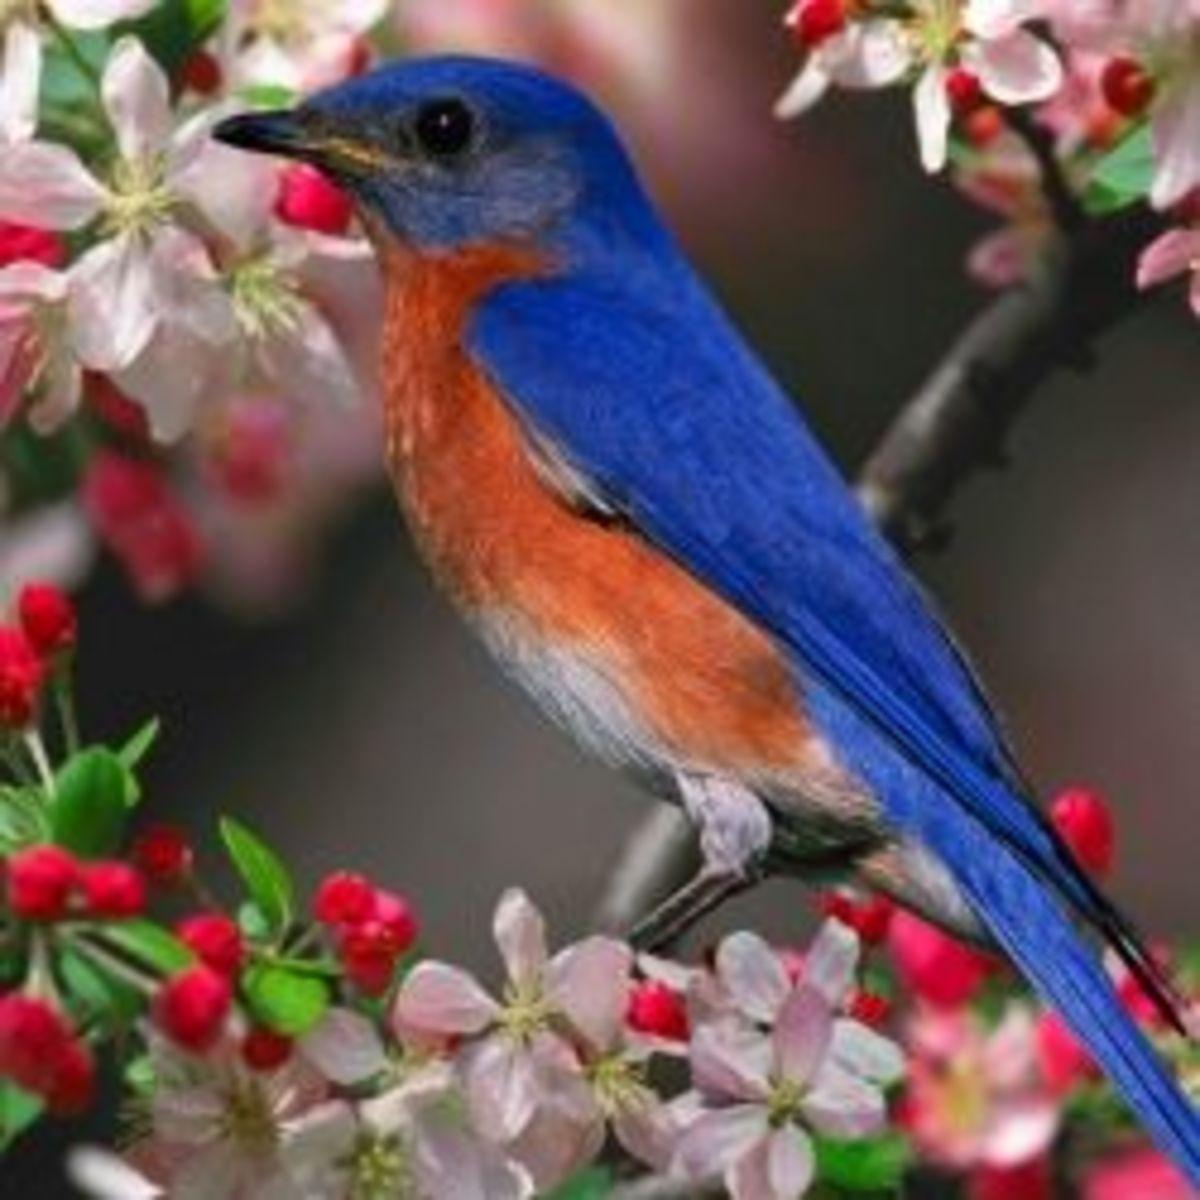 birds-lesson-plan-in-animal-classification-unit-study